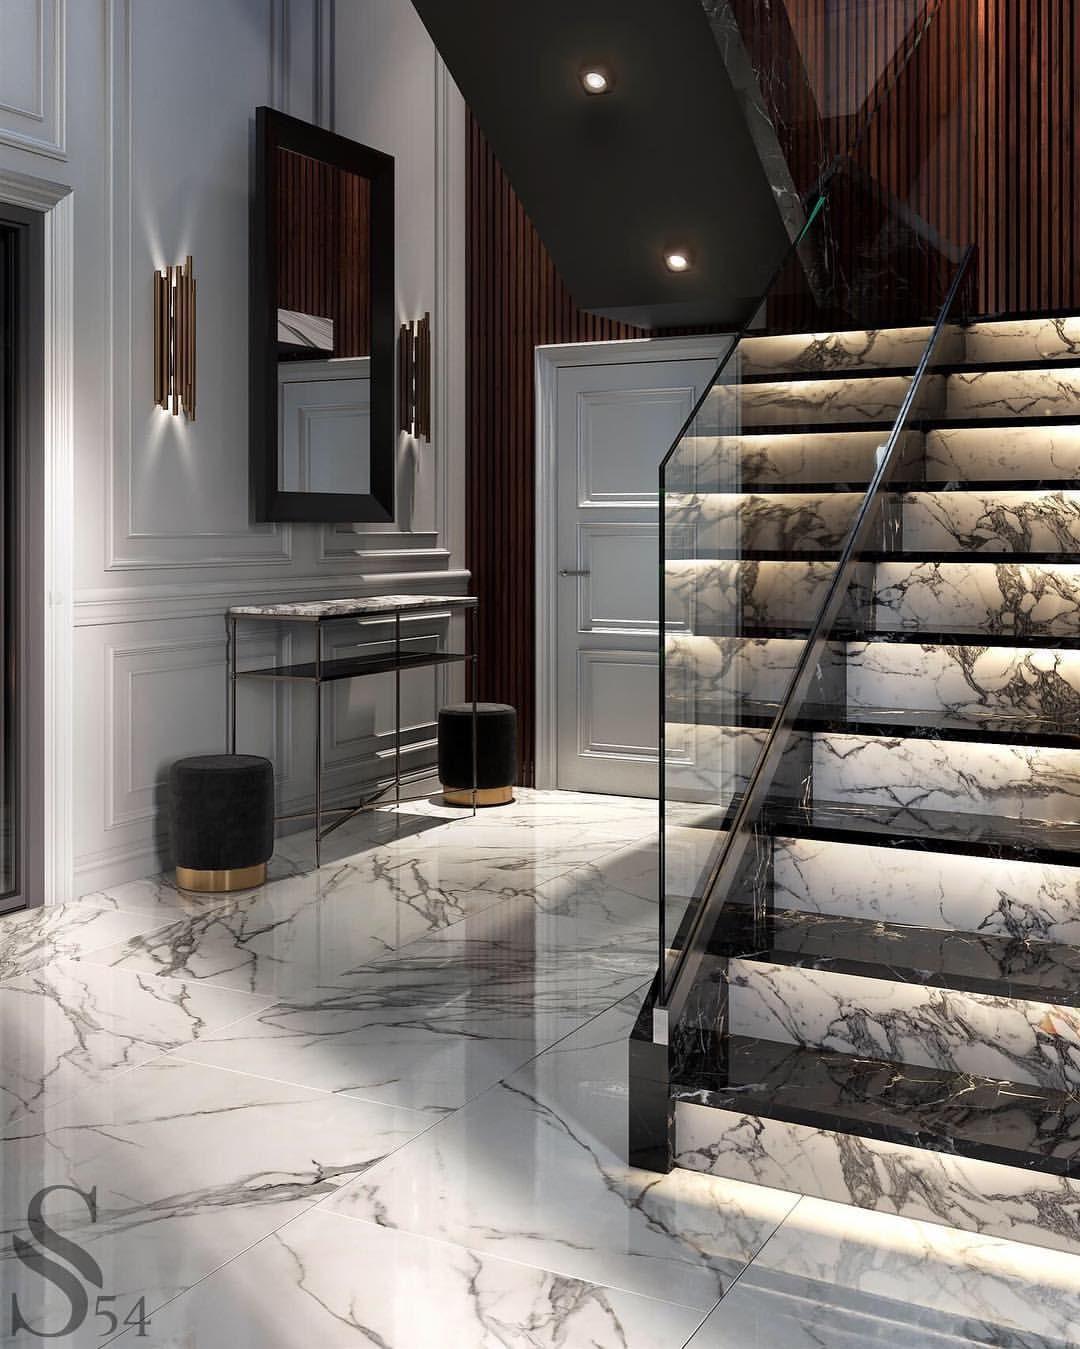 Design  architecture worldwide on instagram   also contemporary arabic interior for  dream house in white style rh pinterest